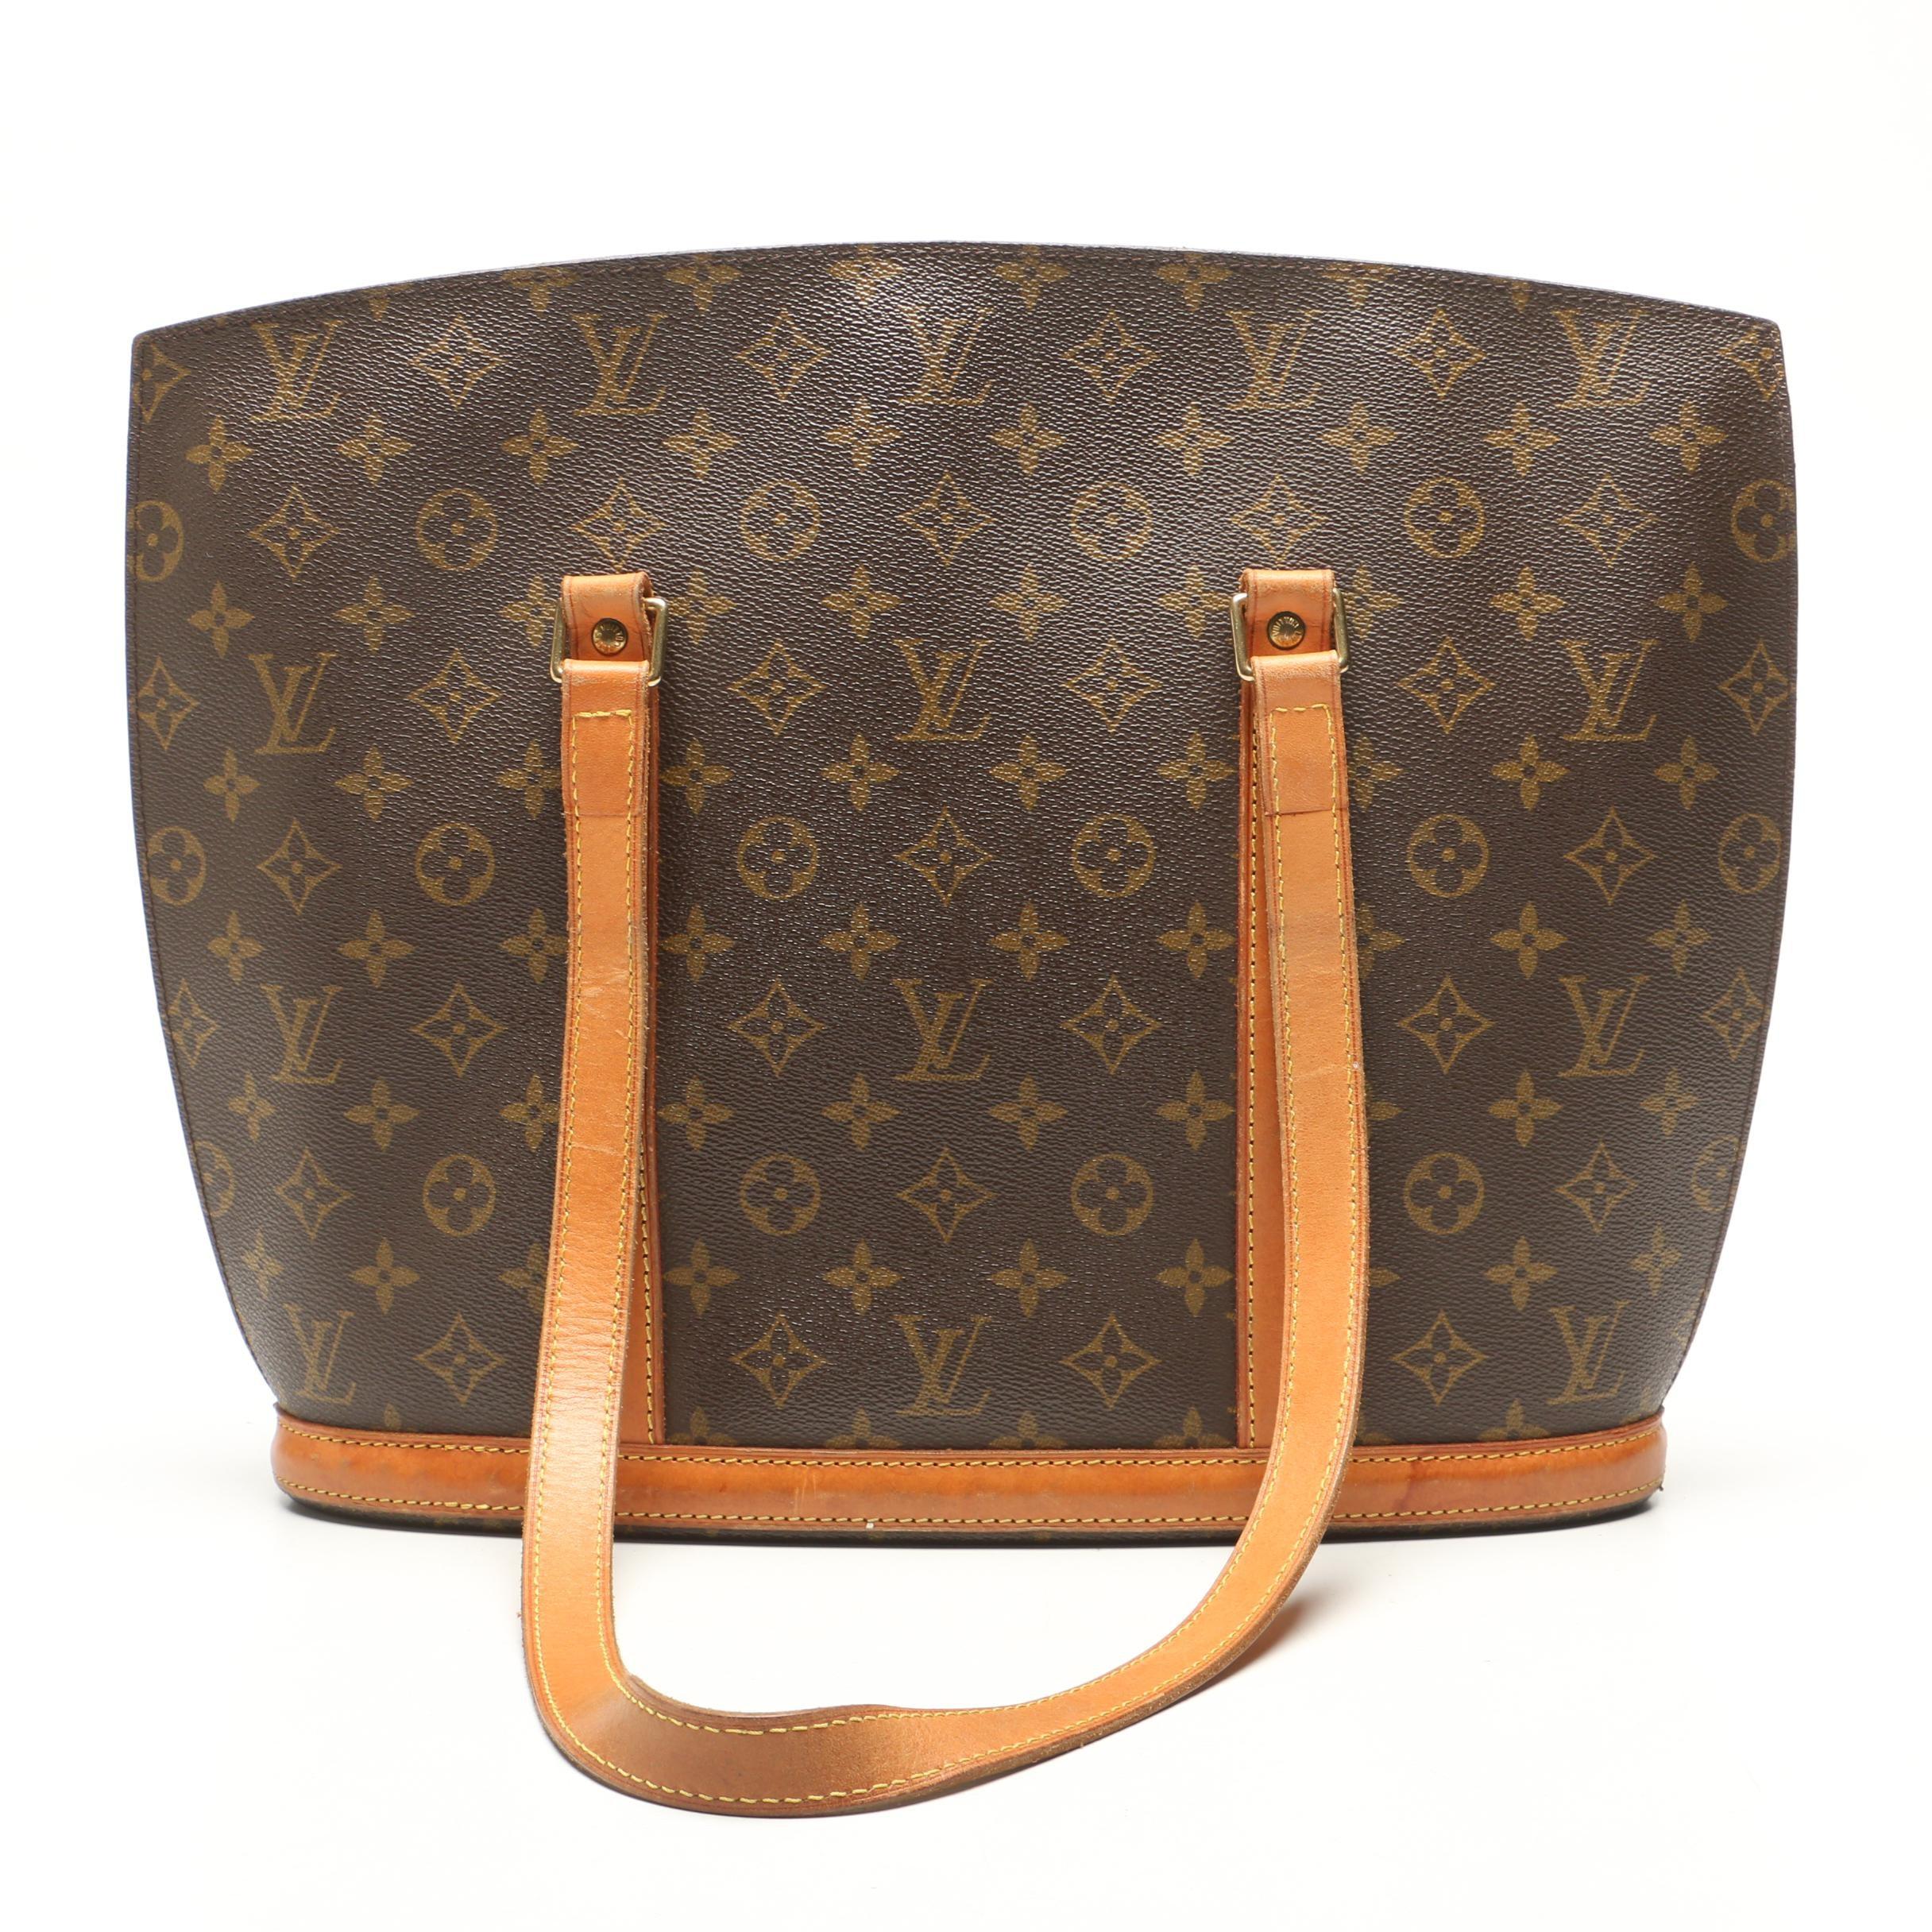 Louis Vuitton Paris Monogram Canvas Babylone Tote Bag